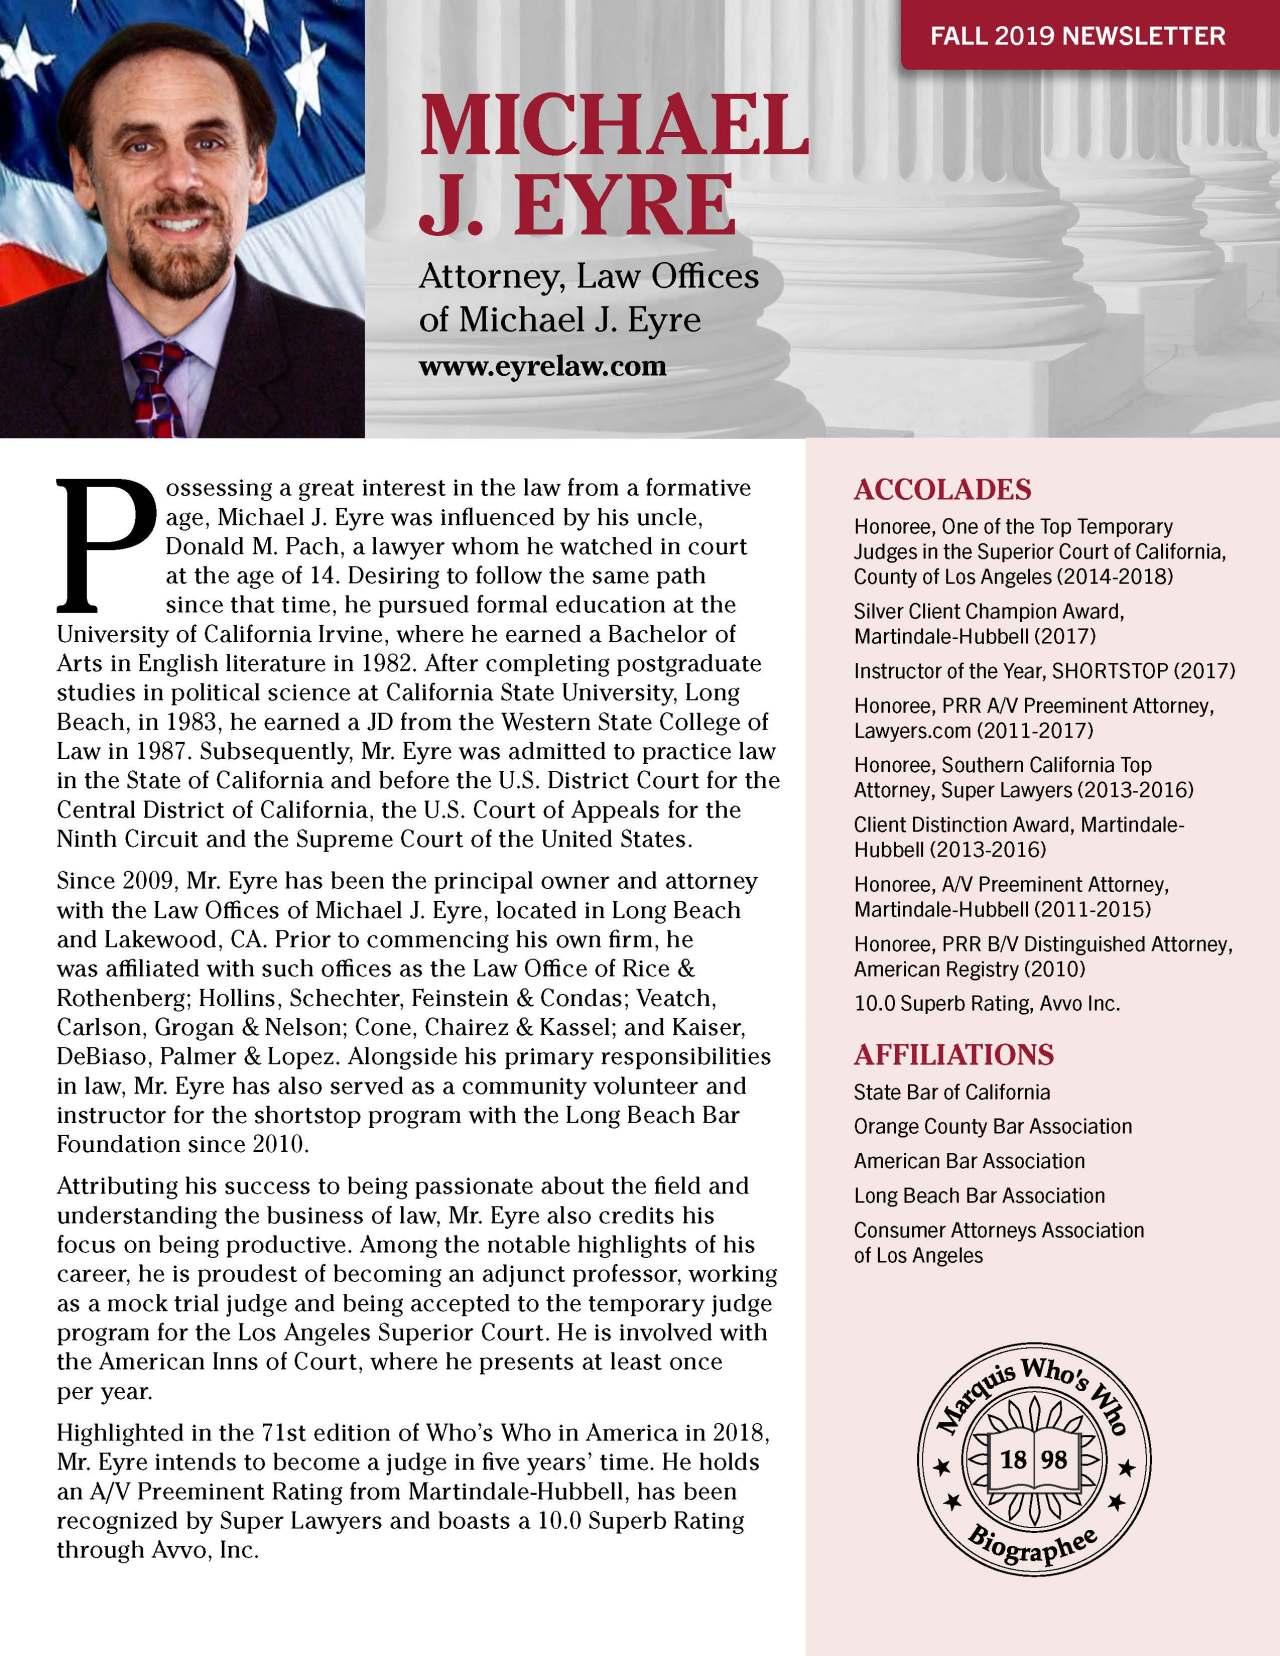 Eyre, Michael 1863236_40004045 Newsletter